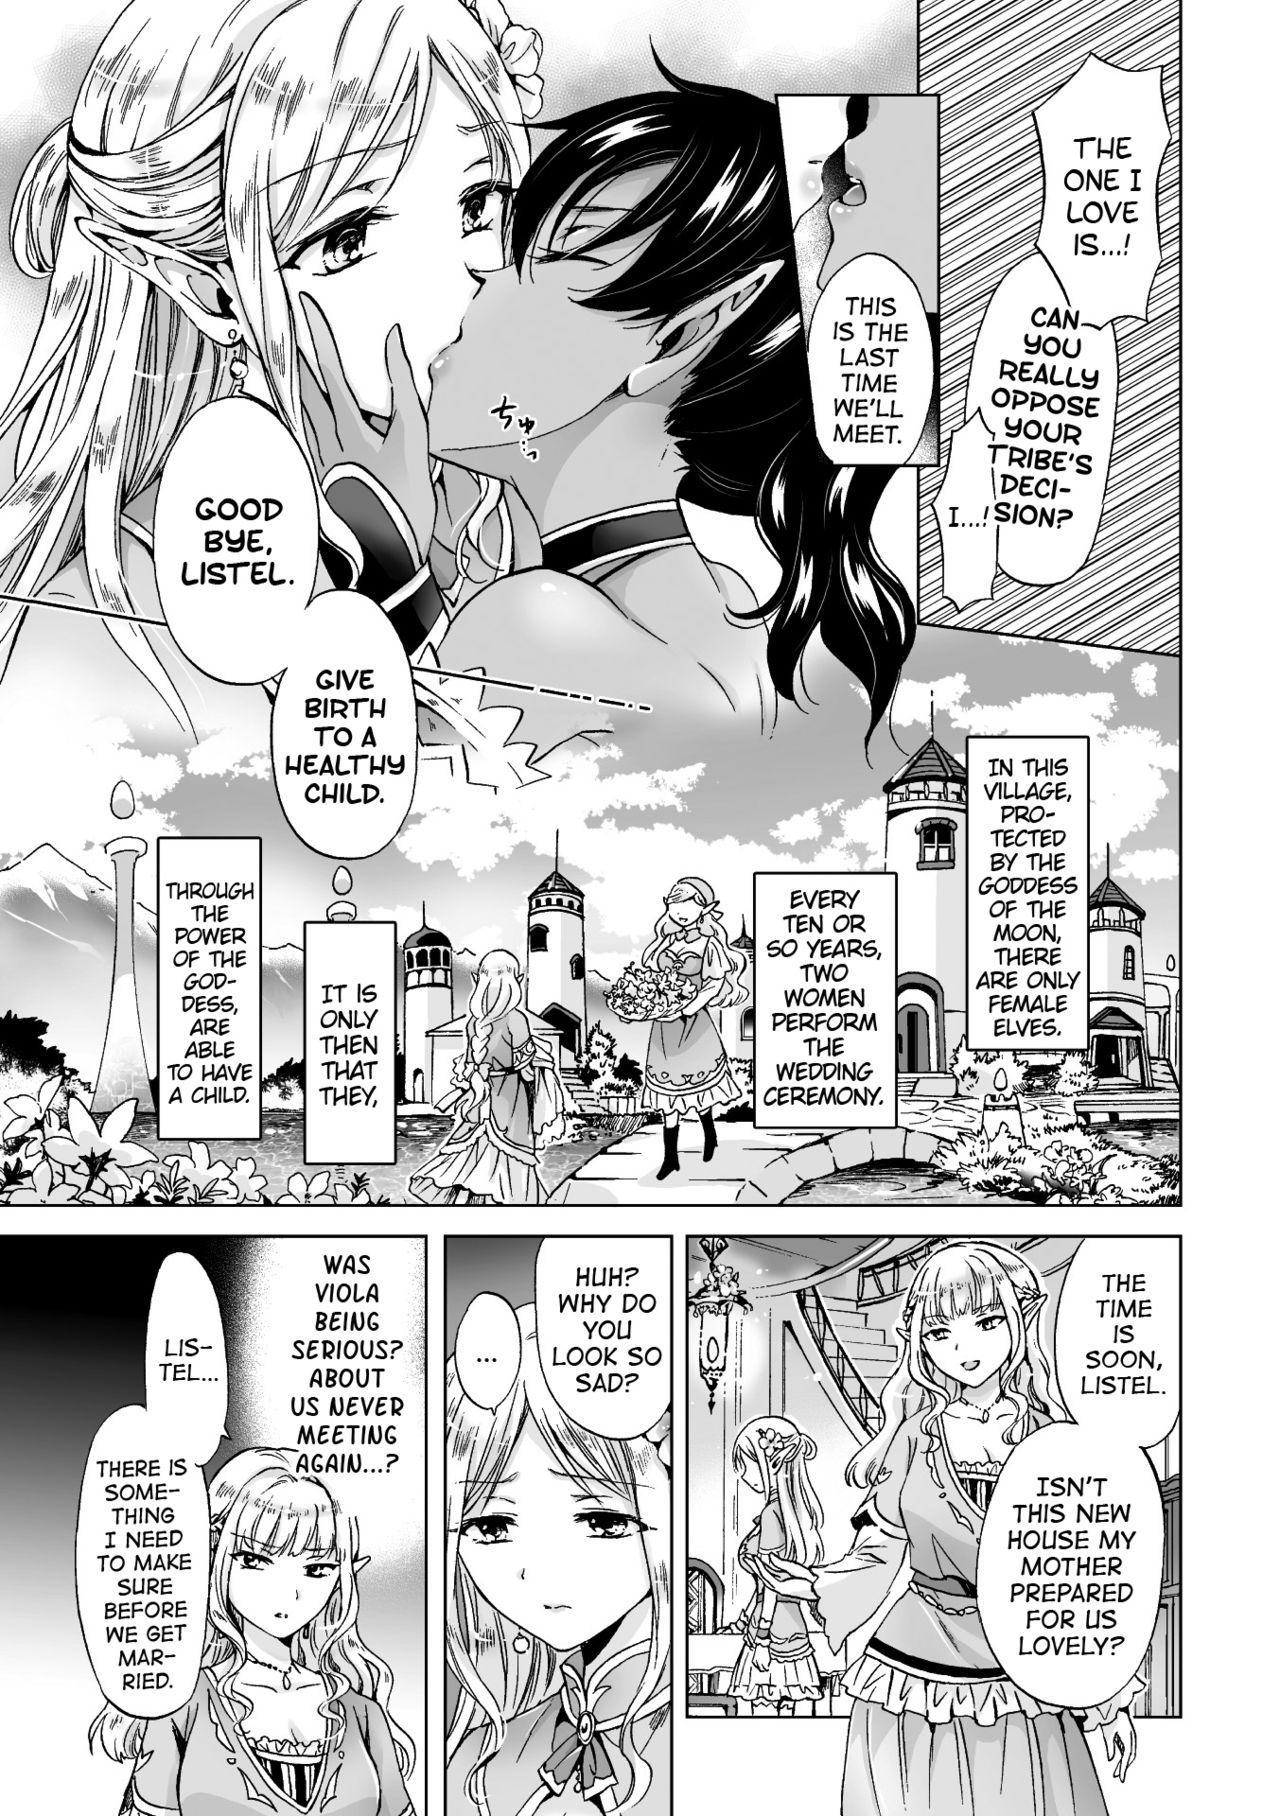 [Mira] elf ~Tsuki no Mahou~ | Elf ~Magic of the Moon~ (2D Comic Magazine Yuri Ninshin Vol. 3) [English] [ATF] [Digital] 2